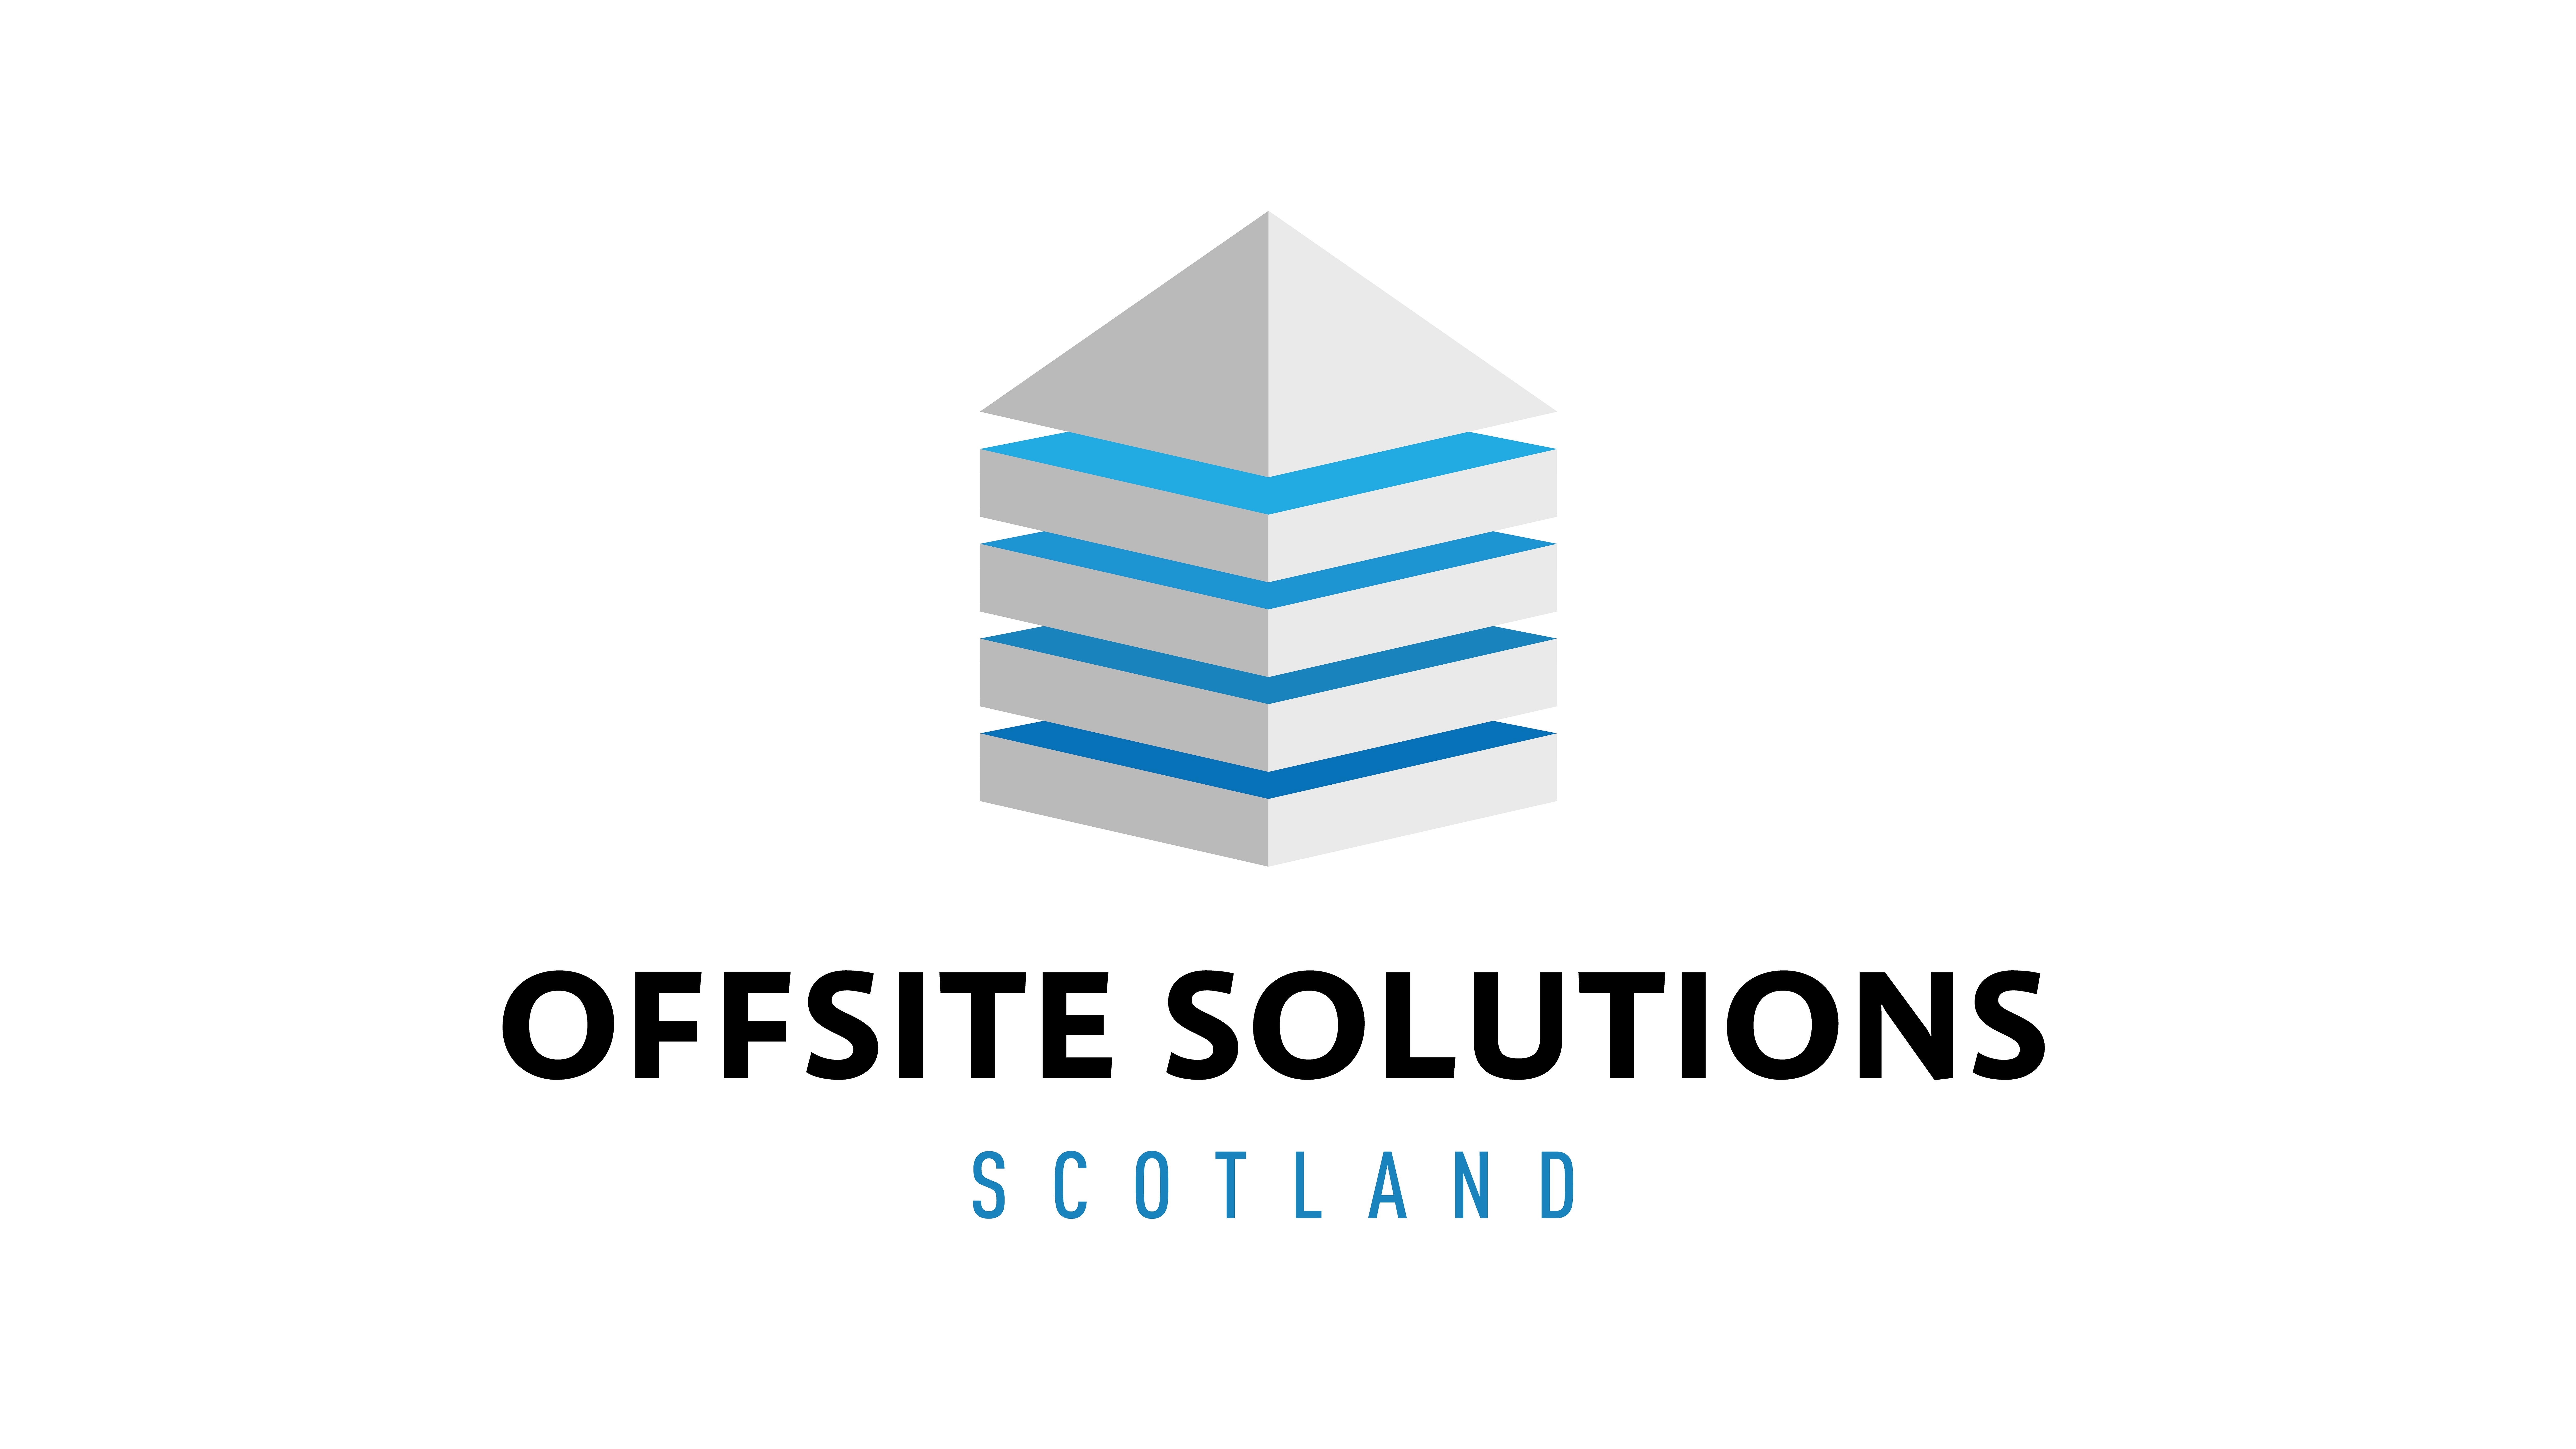 OFFSITE SOLUTIONS SCOTLAND